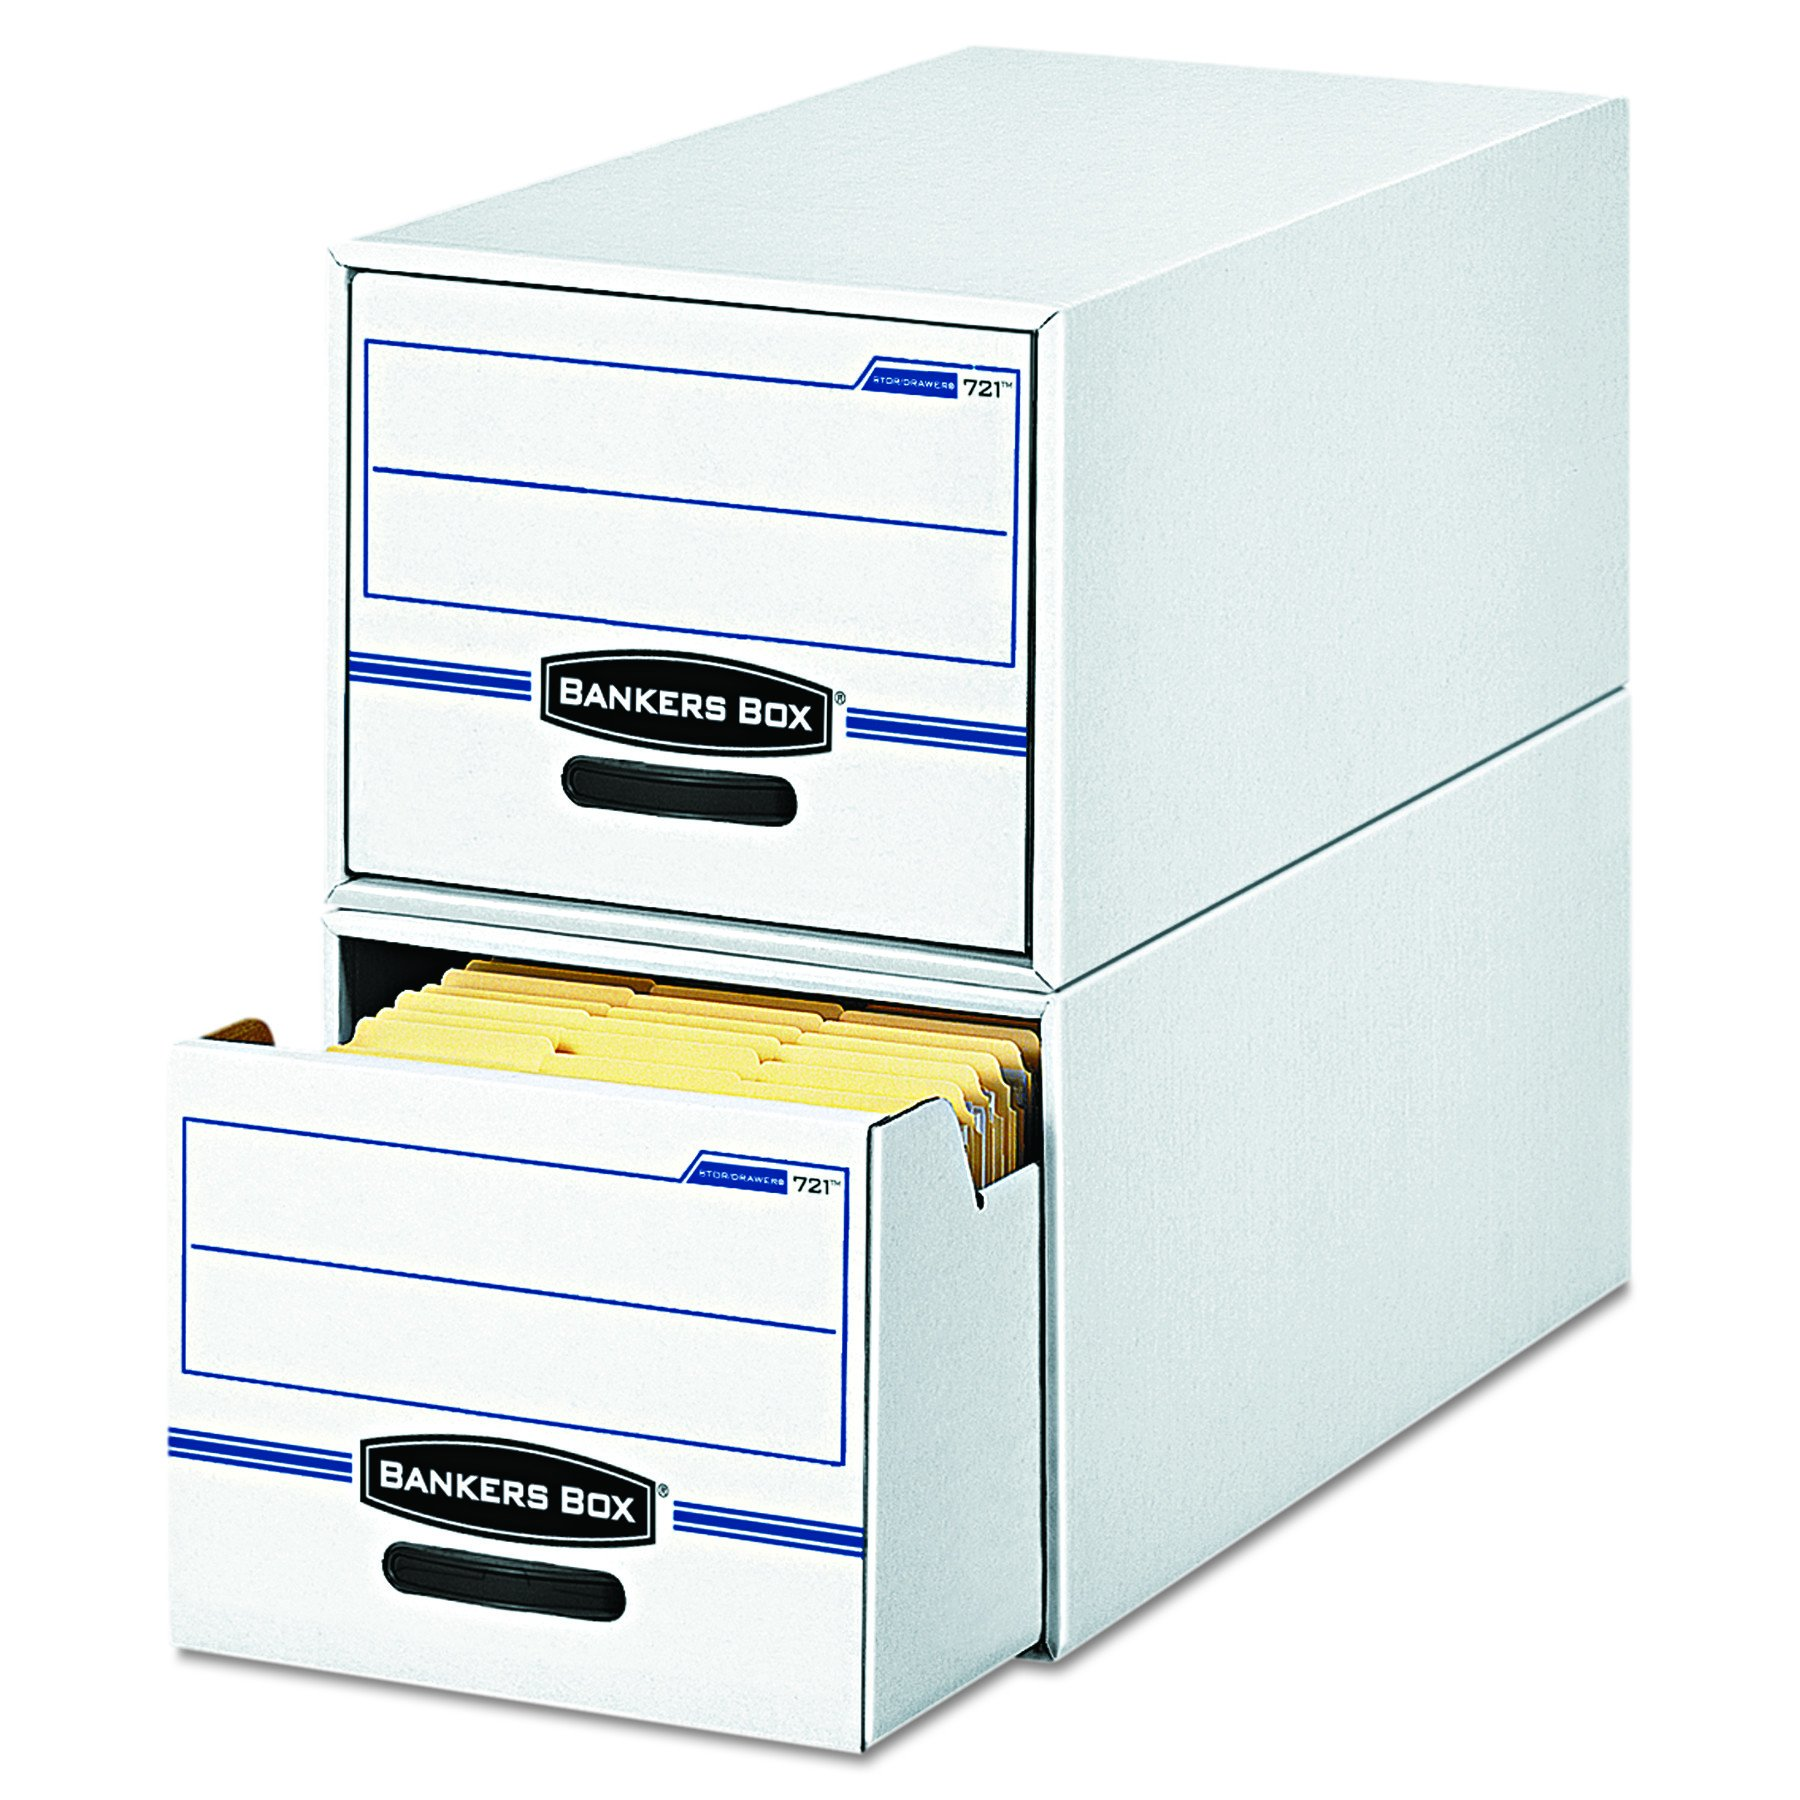 Bankers Box 00722 STOR/DRAWER File Drawer Storage Box, Legal, White/Blue (Case of 6)